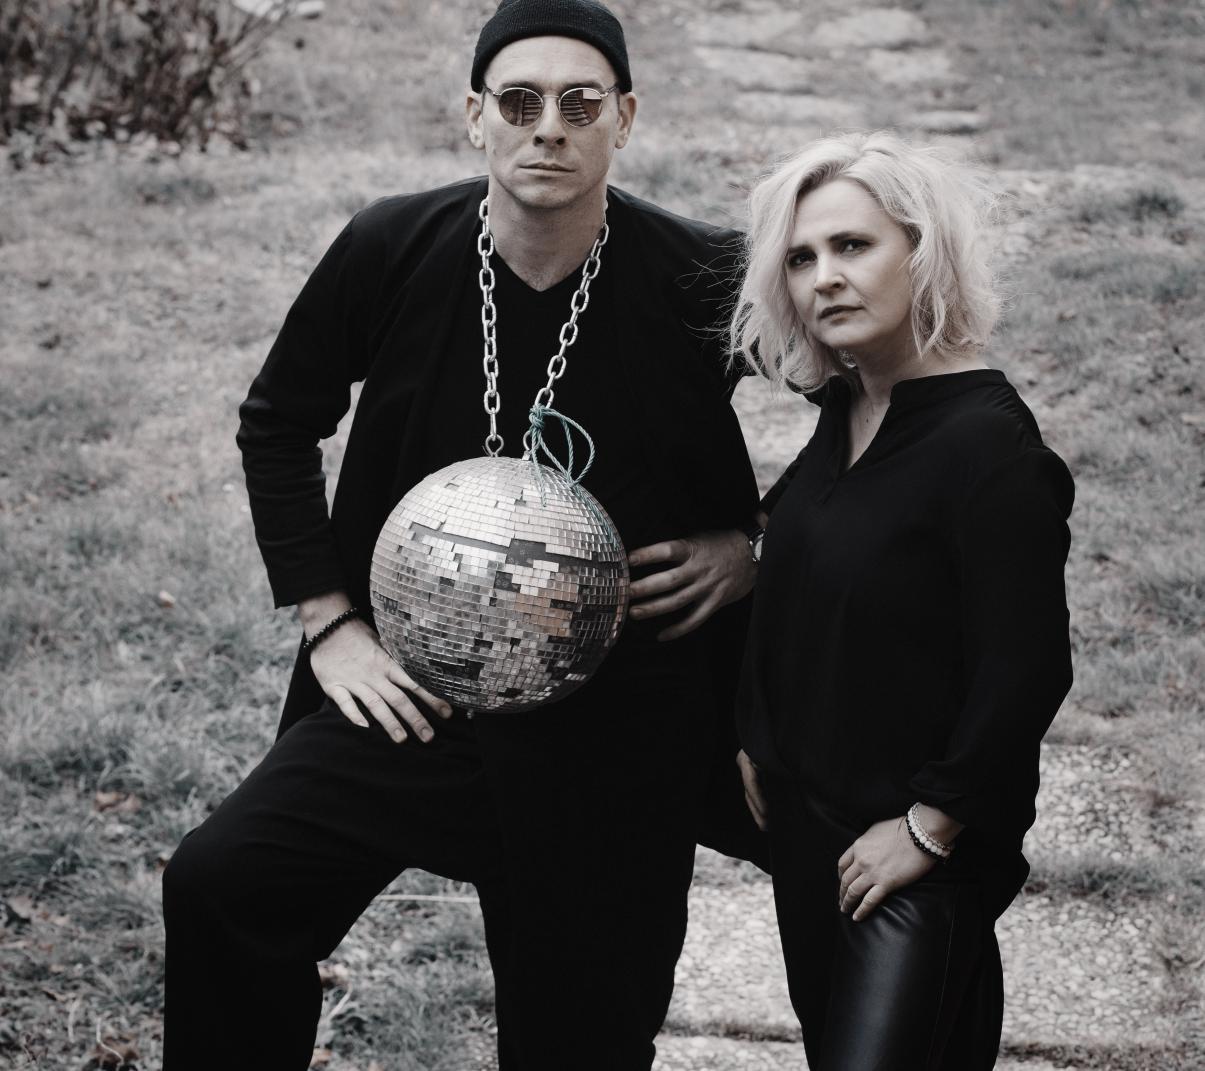 Oskar Török, Beata Hlavenková (foto Pavel Horák, 2019)